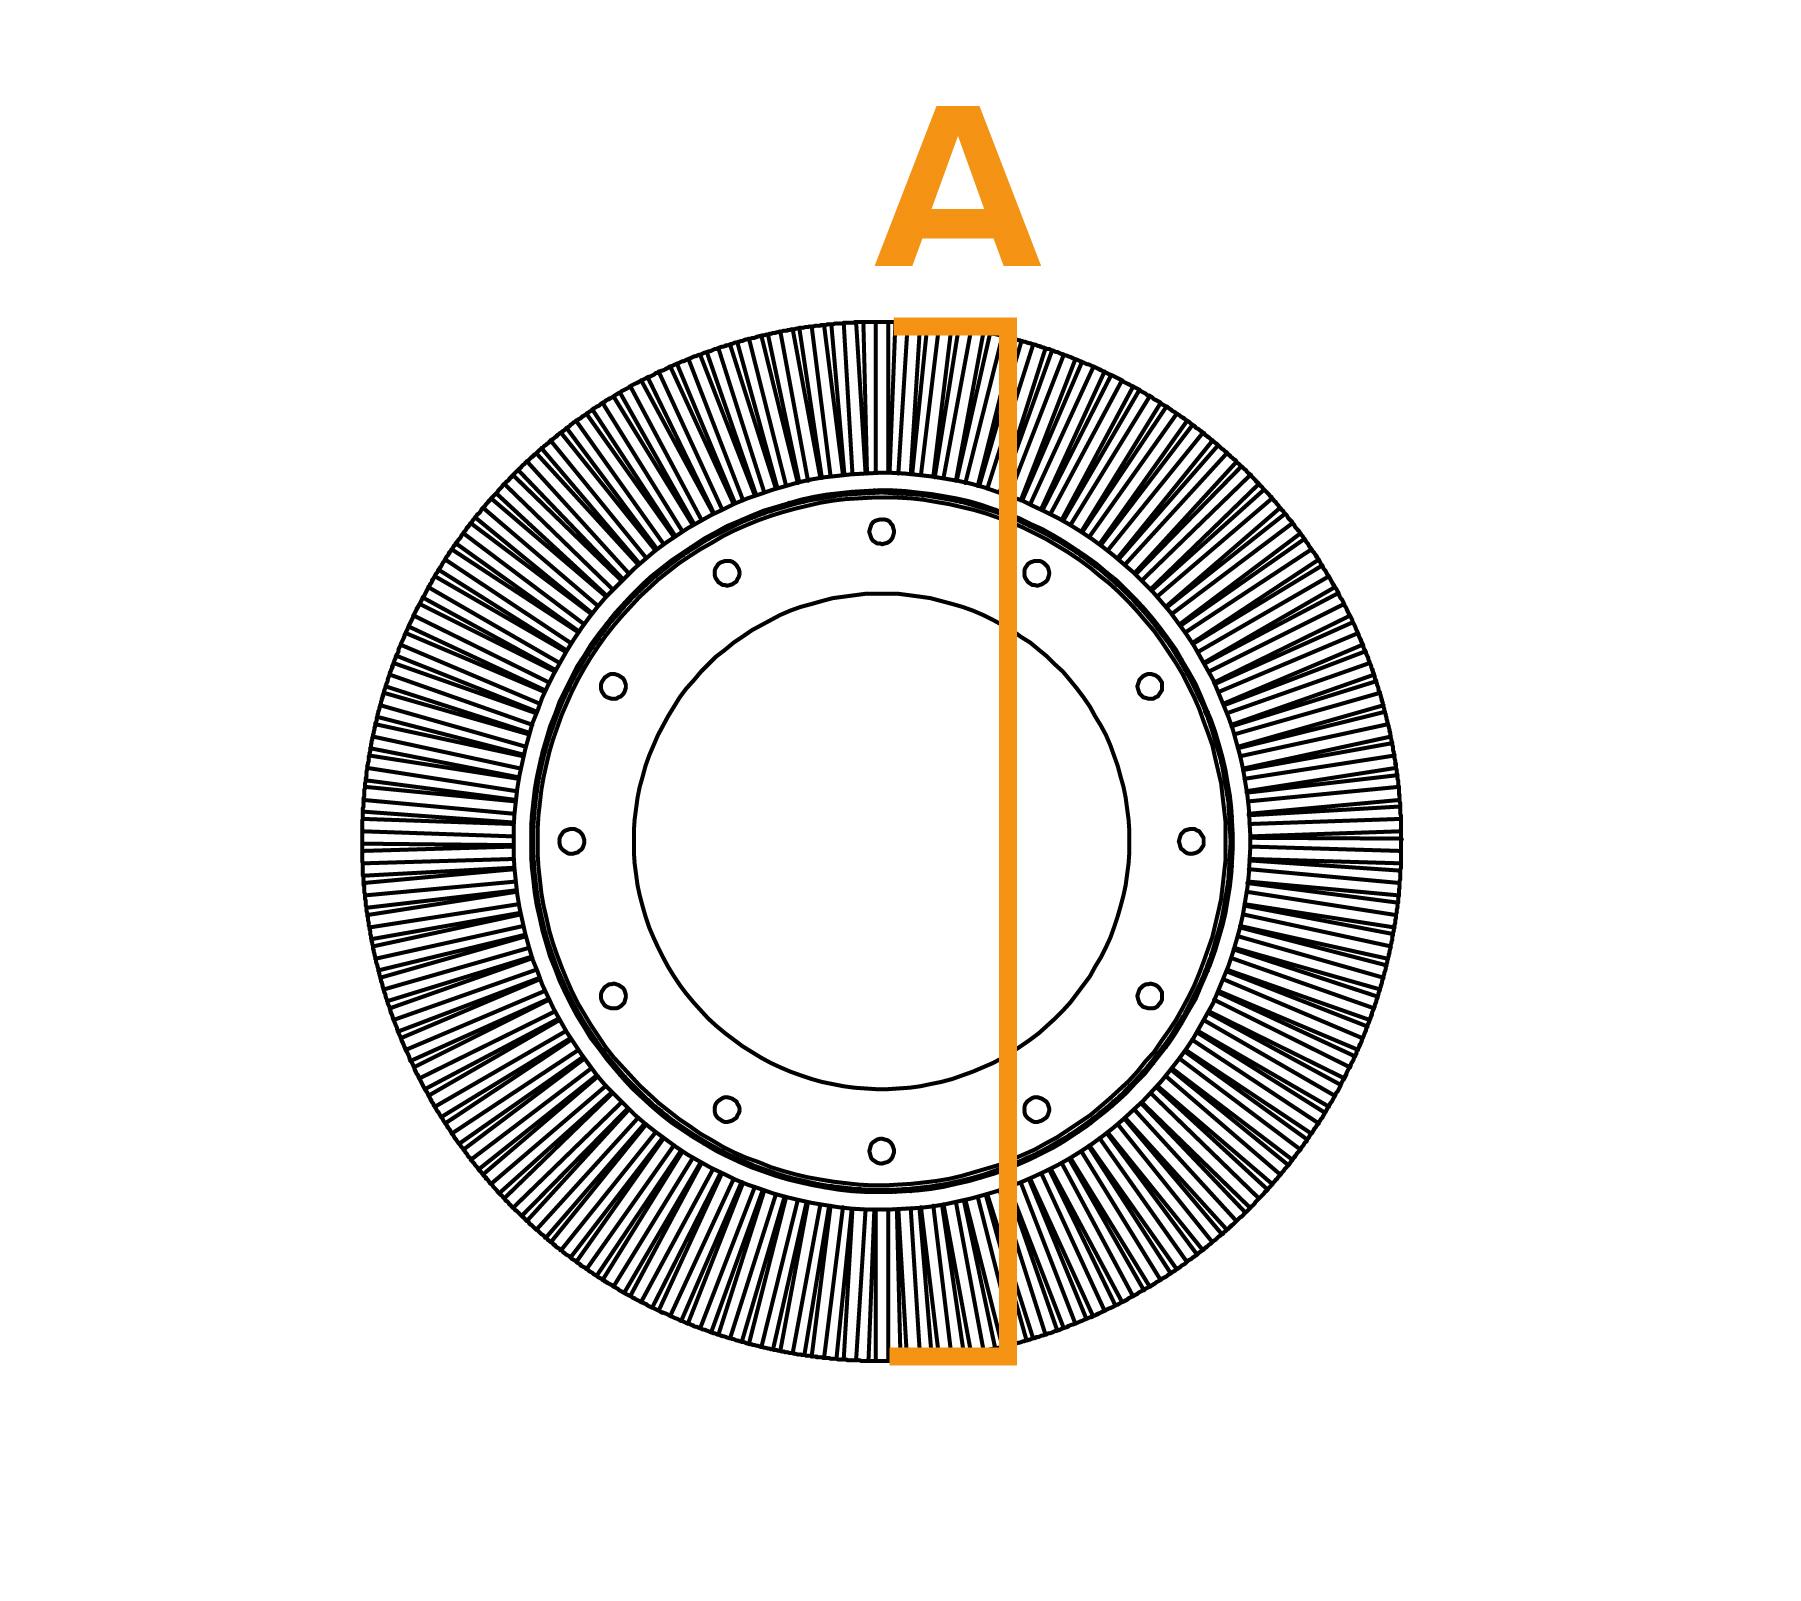 Potloodringborstel met grote diameter - diagram A